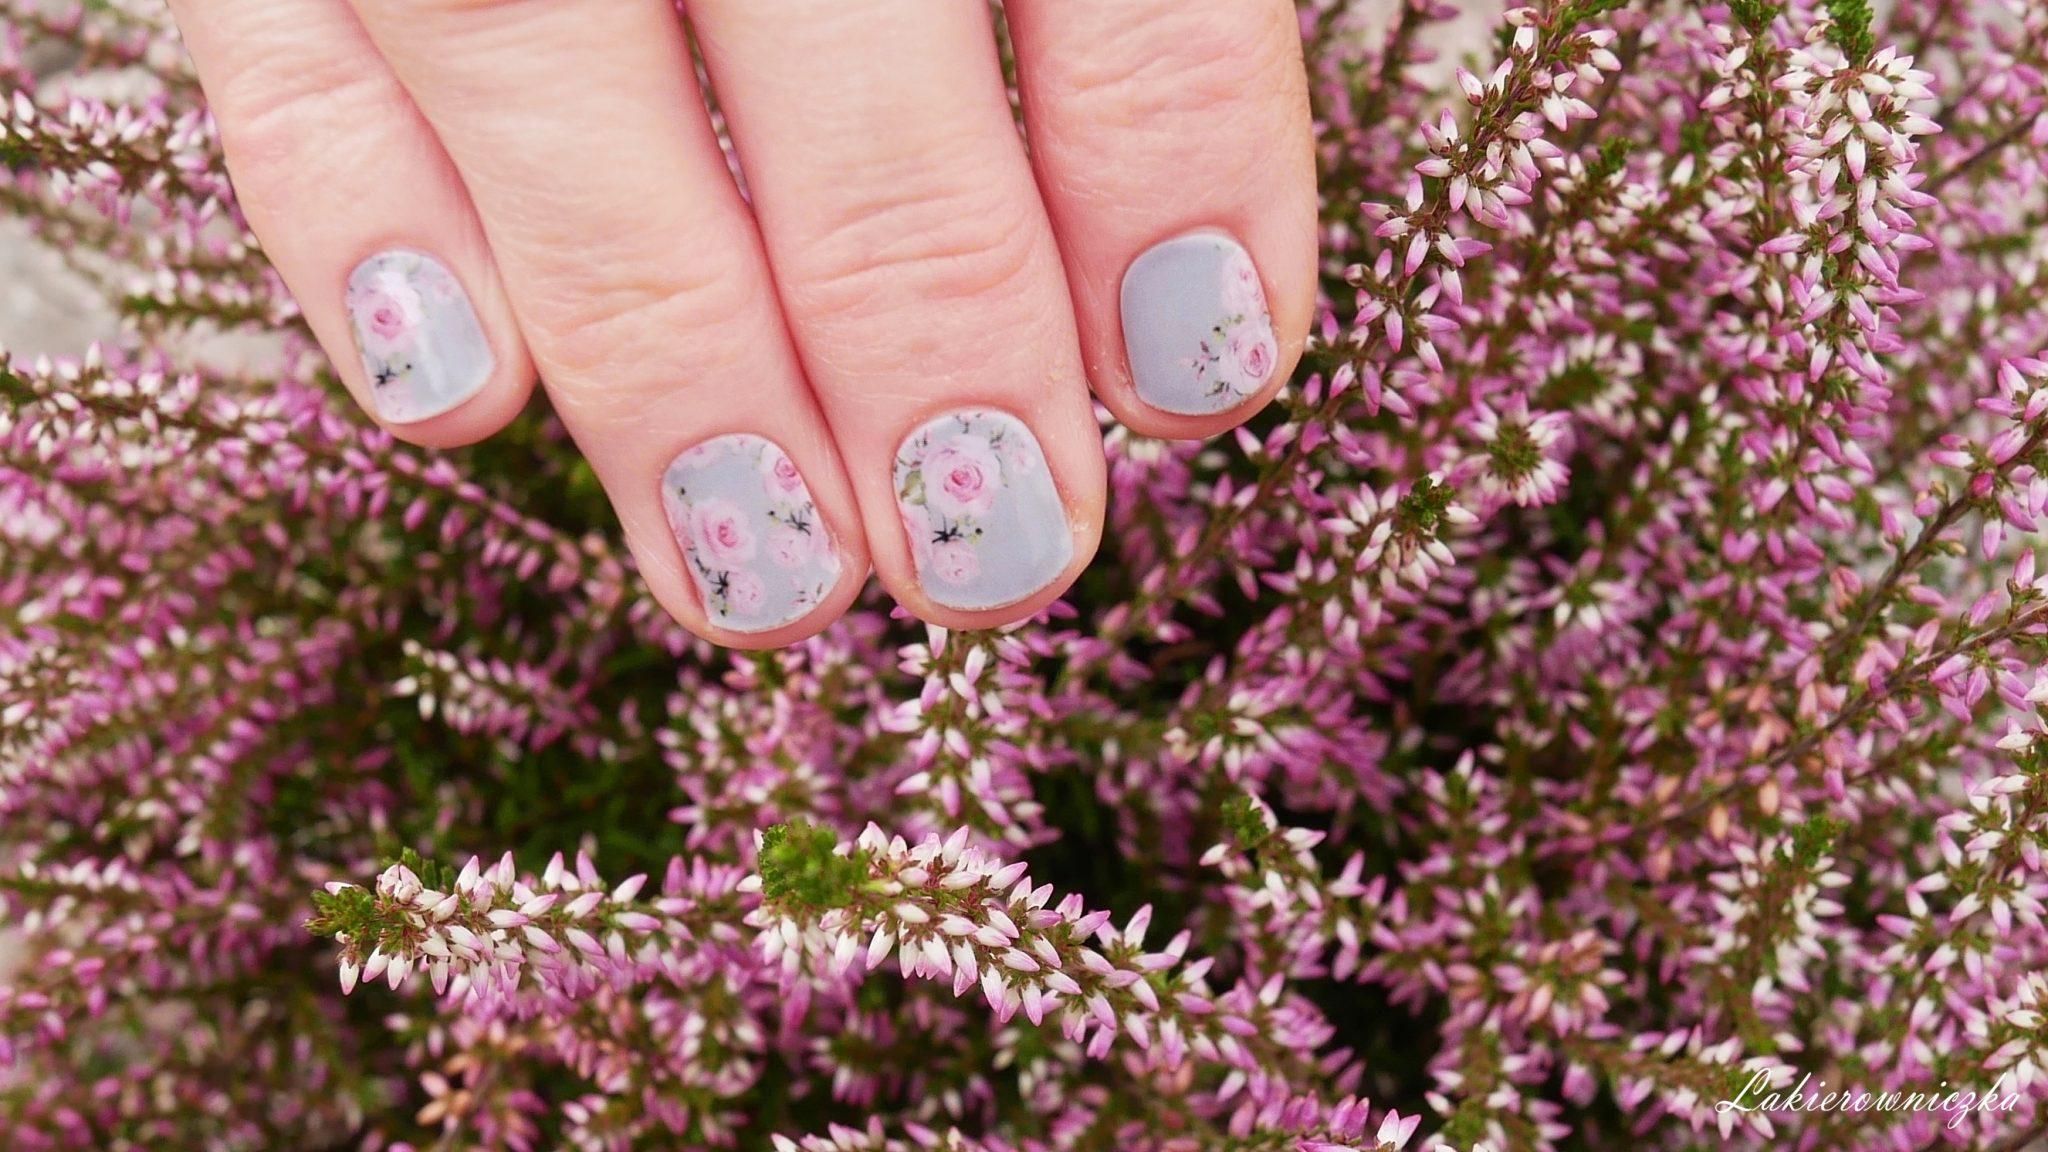 Manirouge-Basia-Blog-Rose-nakeljki-termiczne-szarne-paznokcie-w-roze-stickers-rose-nails-nailart-Lakierowniczka